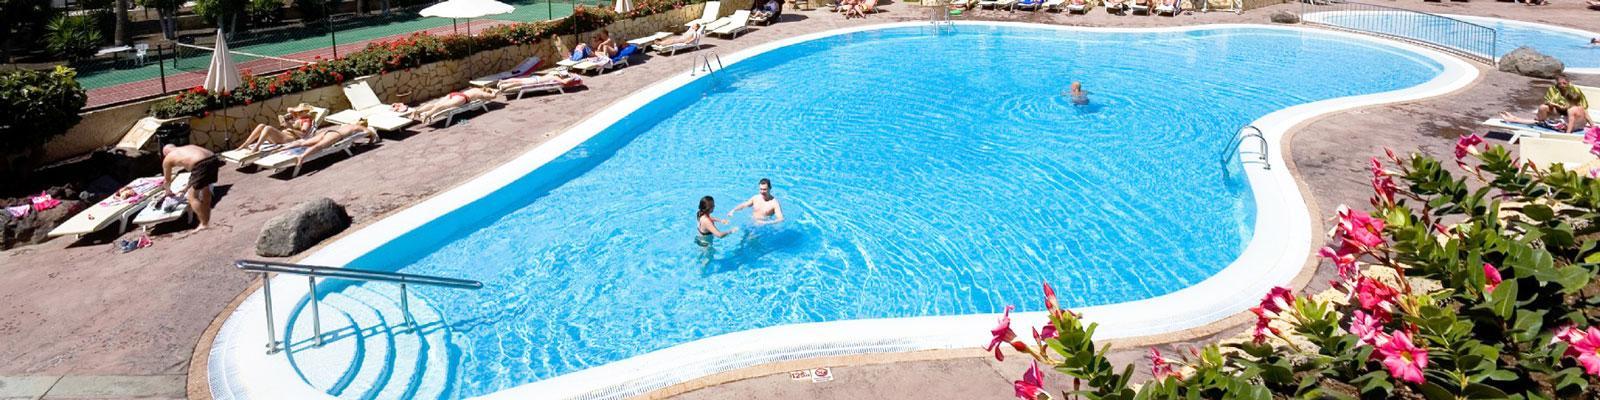 Olè Tropical Hotel - Las Americas Tenerife